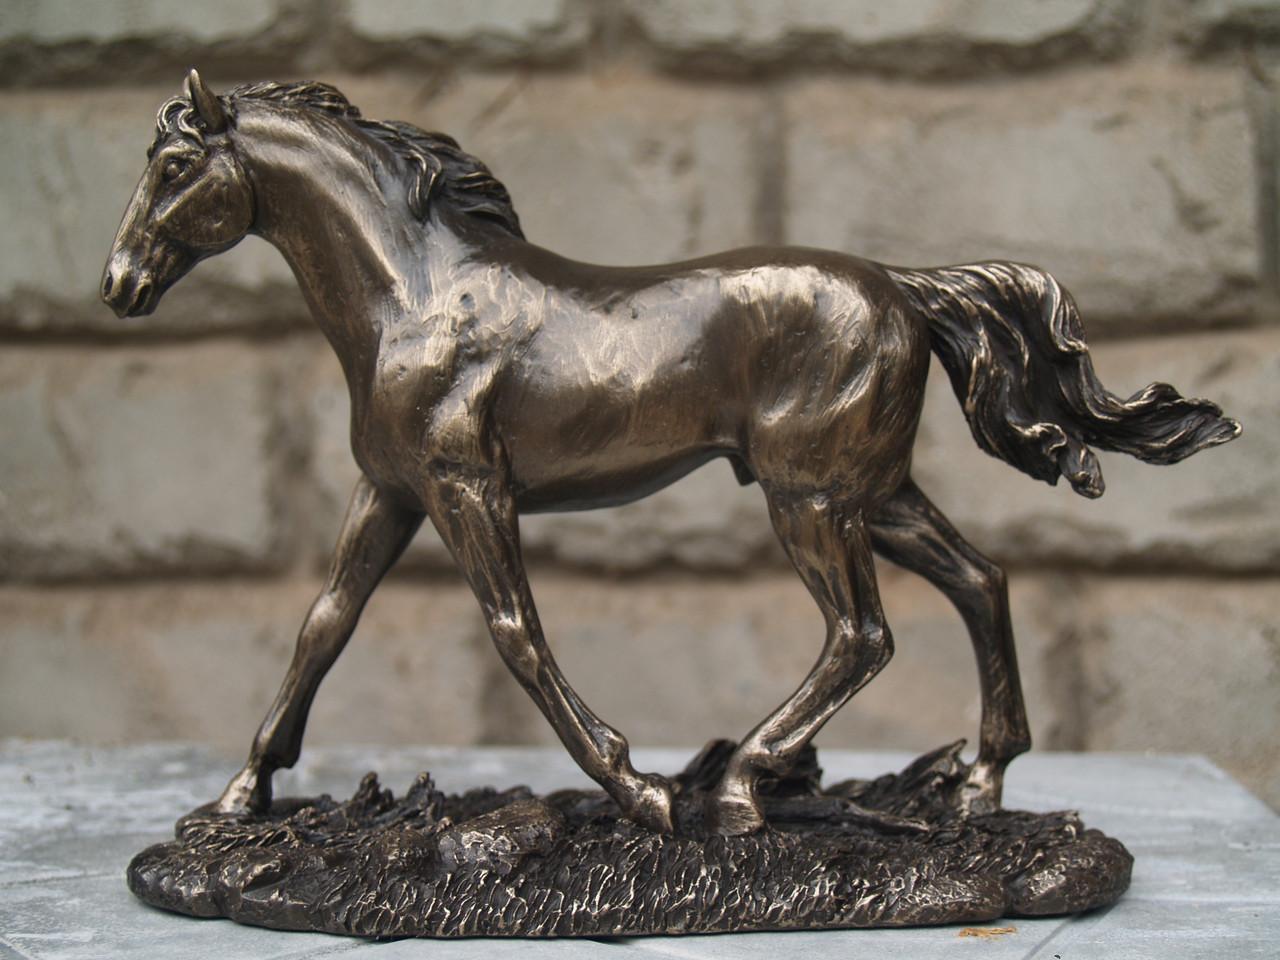 Статуетка Veronese Біжить кінь 14 см 76064 A1